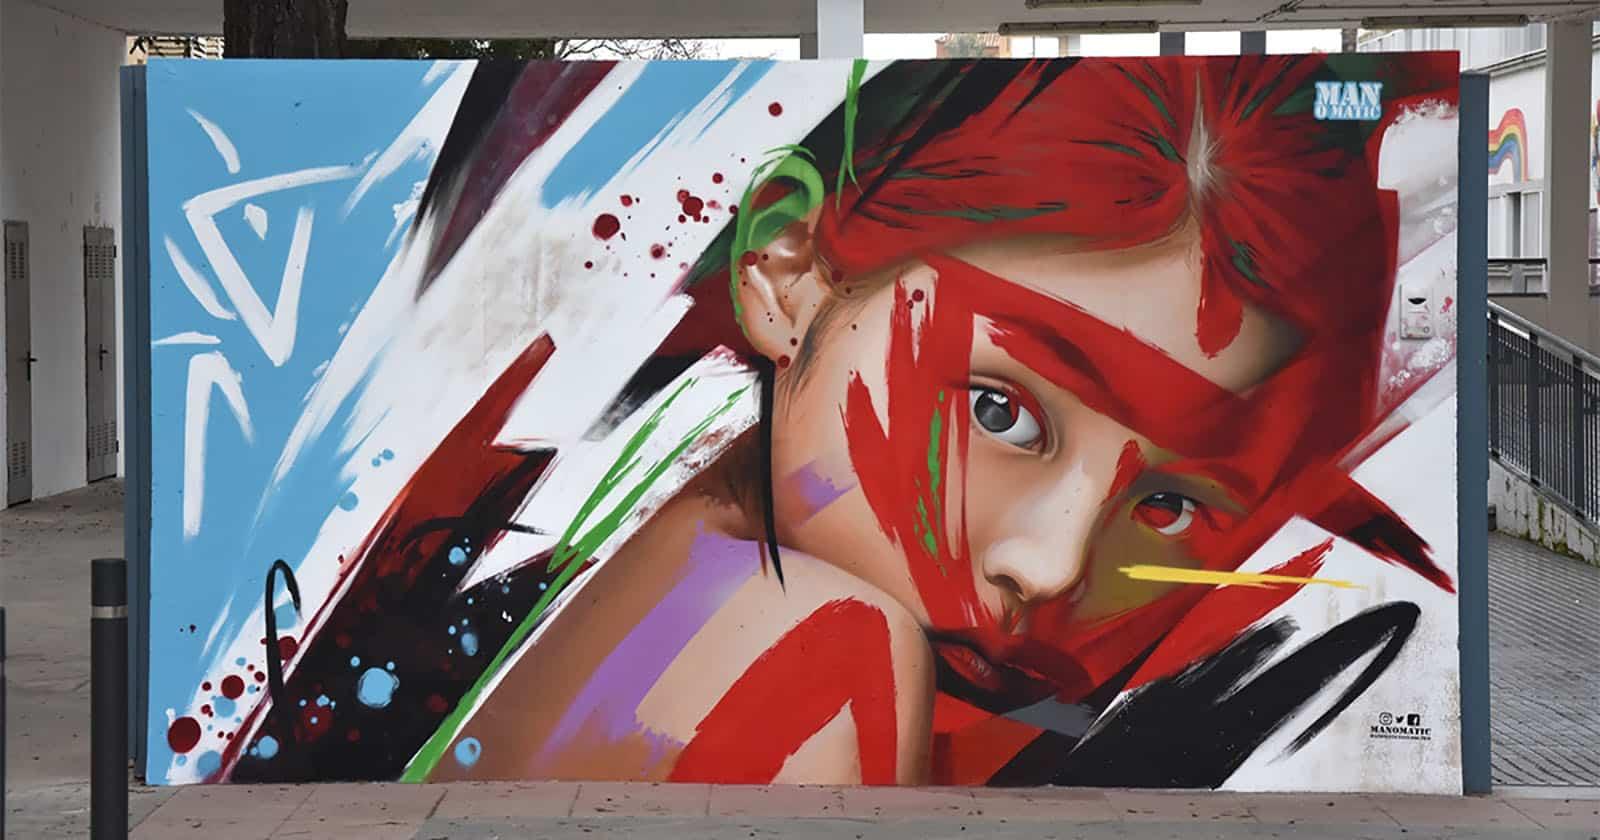 Art Urbain Manomatic